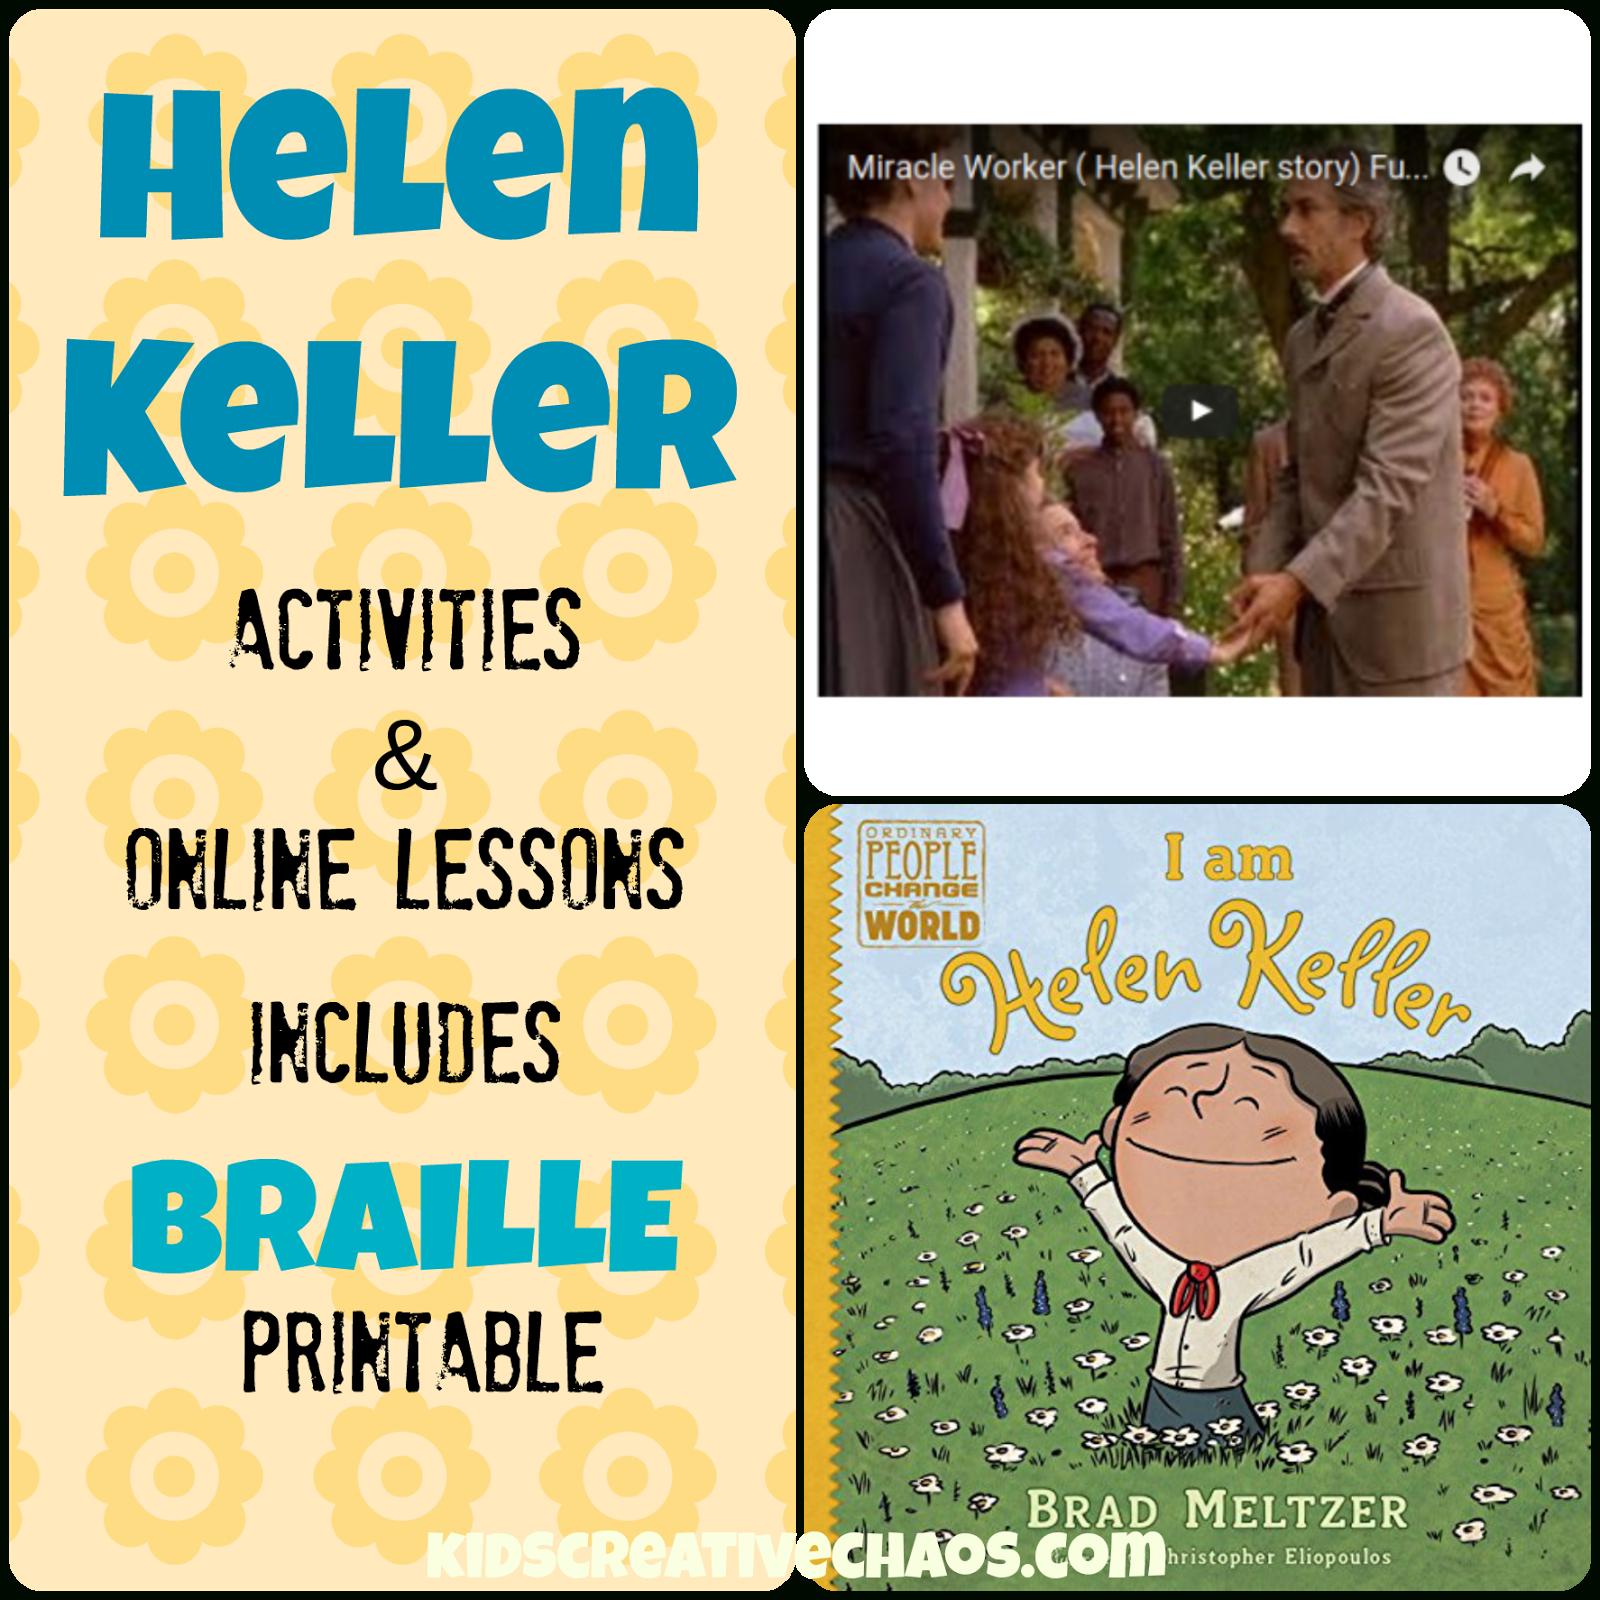 Helen Keller Lesson Plans Elementary Middle School - Kids Creative Chaos - Free Printable Pictures Of Helen Keller